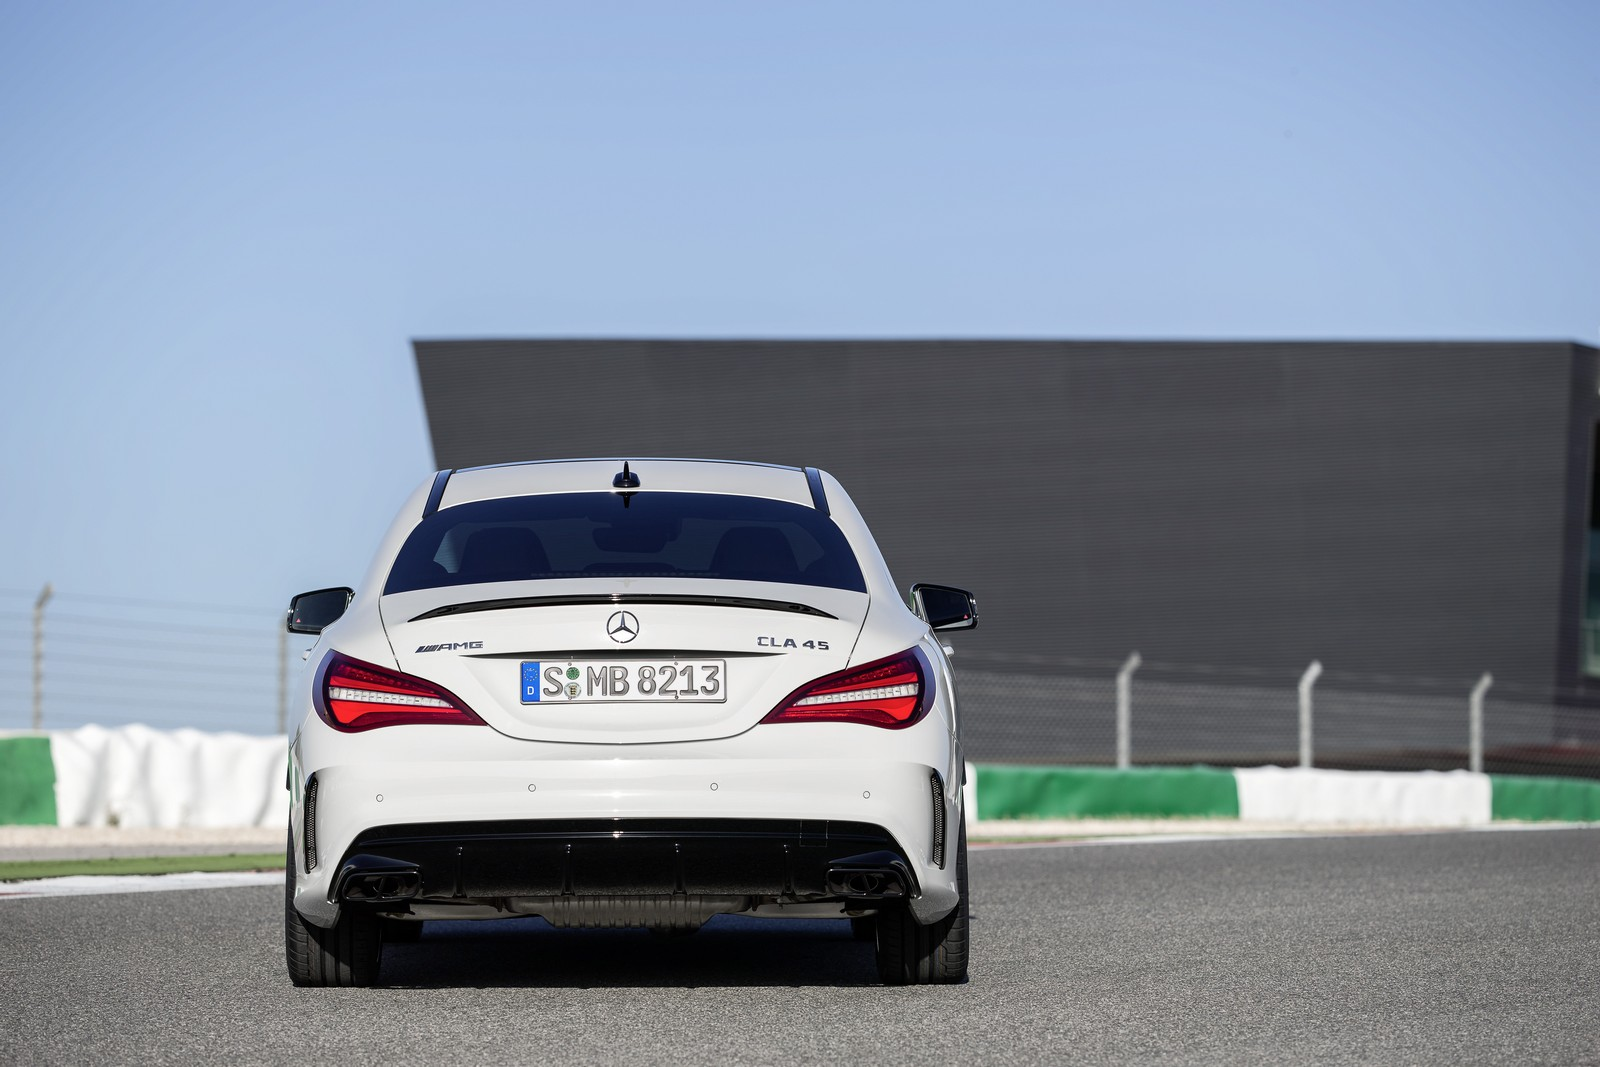 Mercedes-AMG CLA 45 (C/X117), 2016